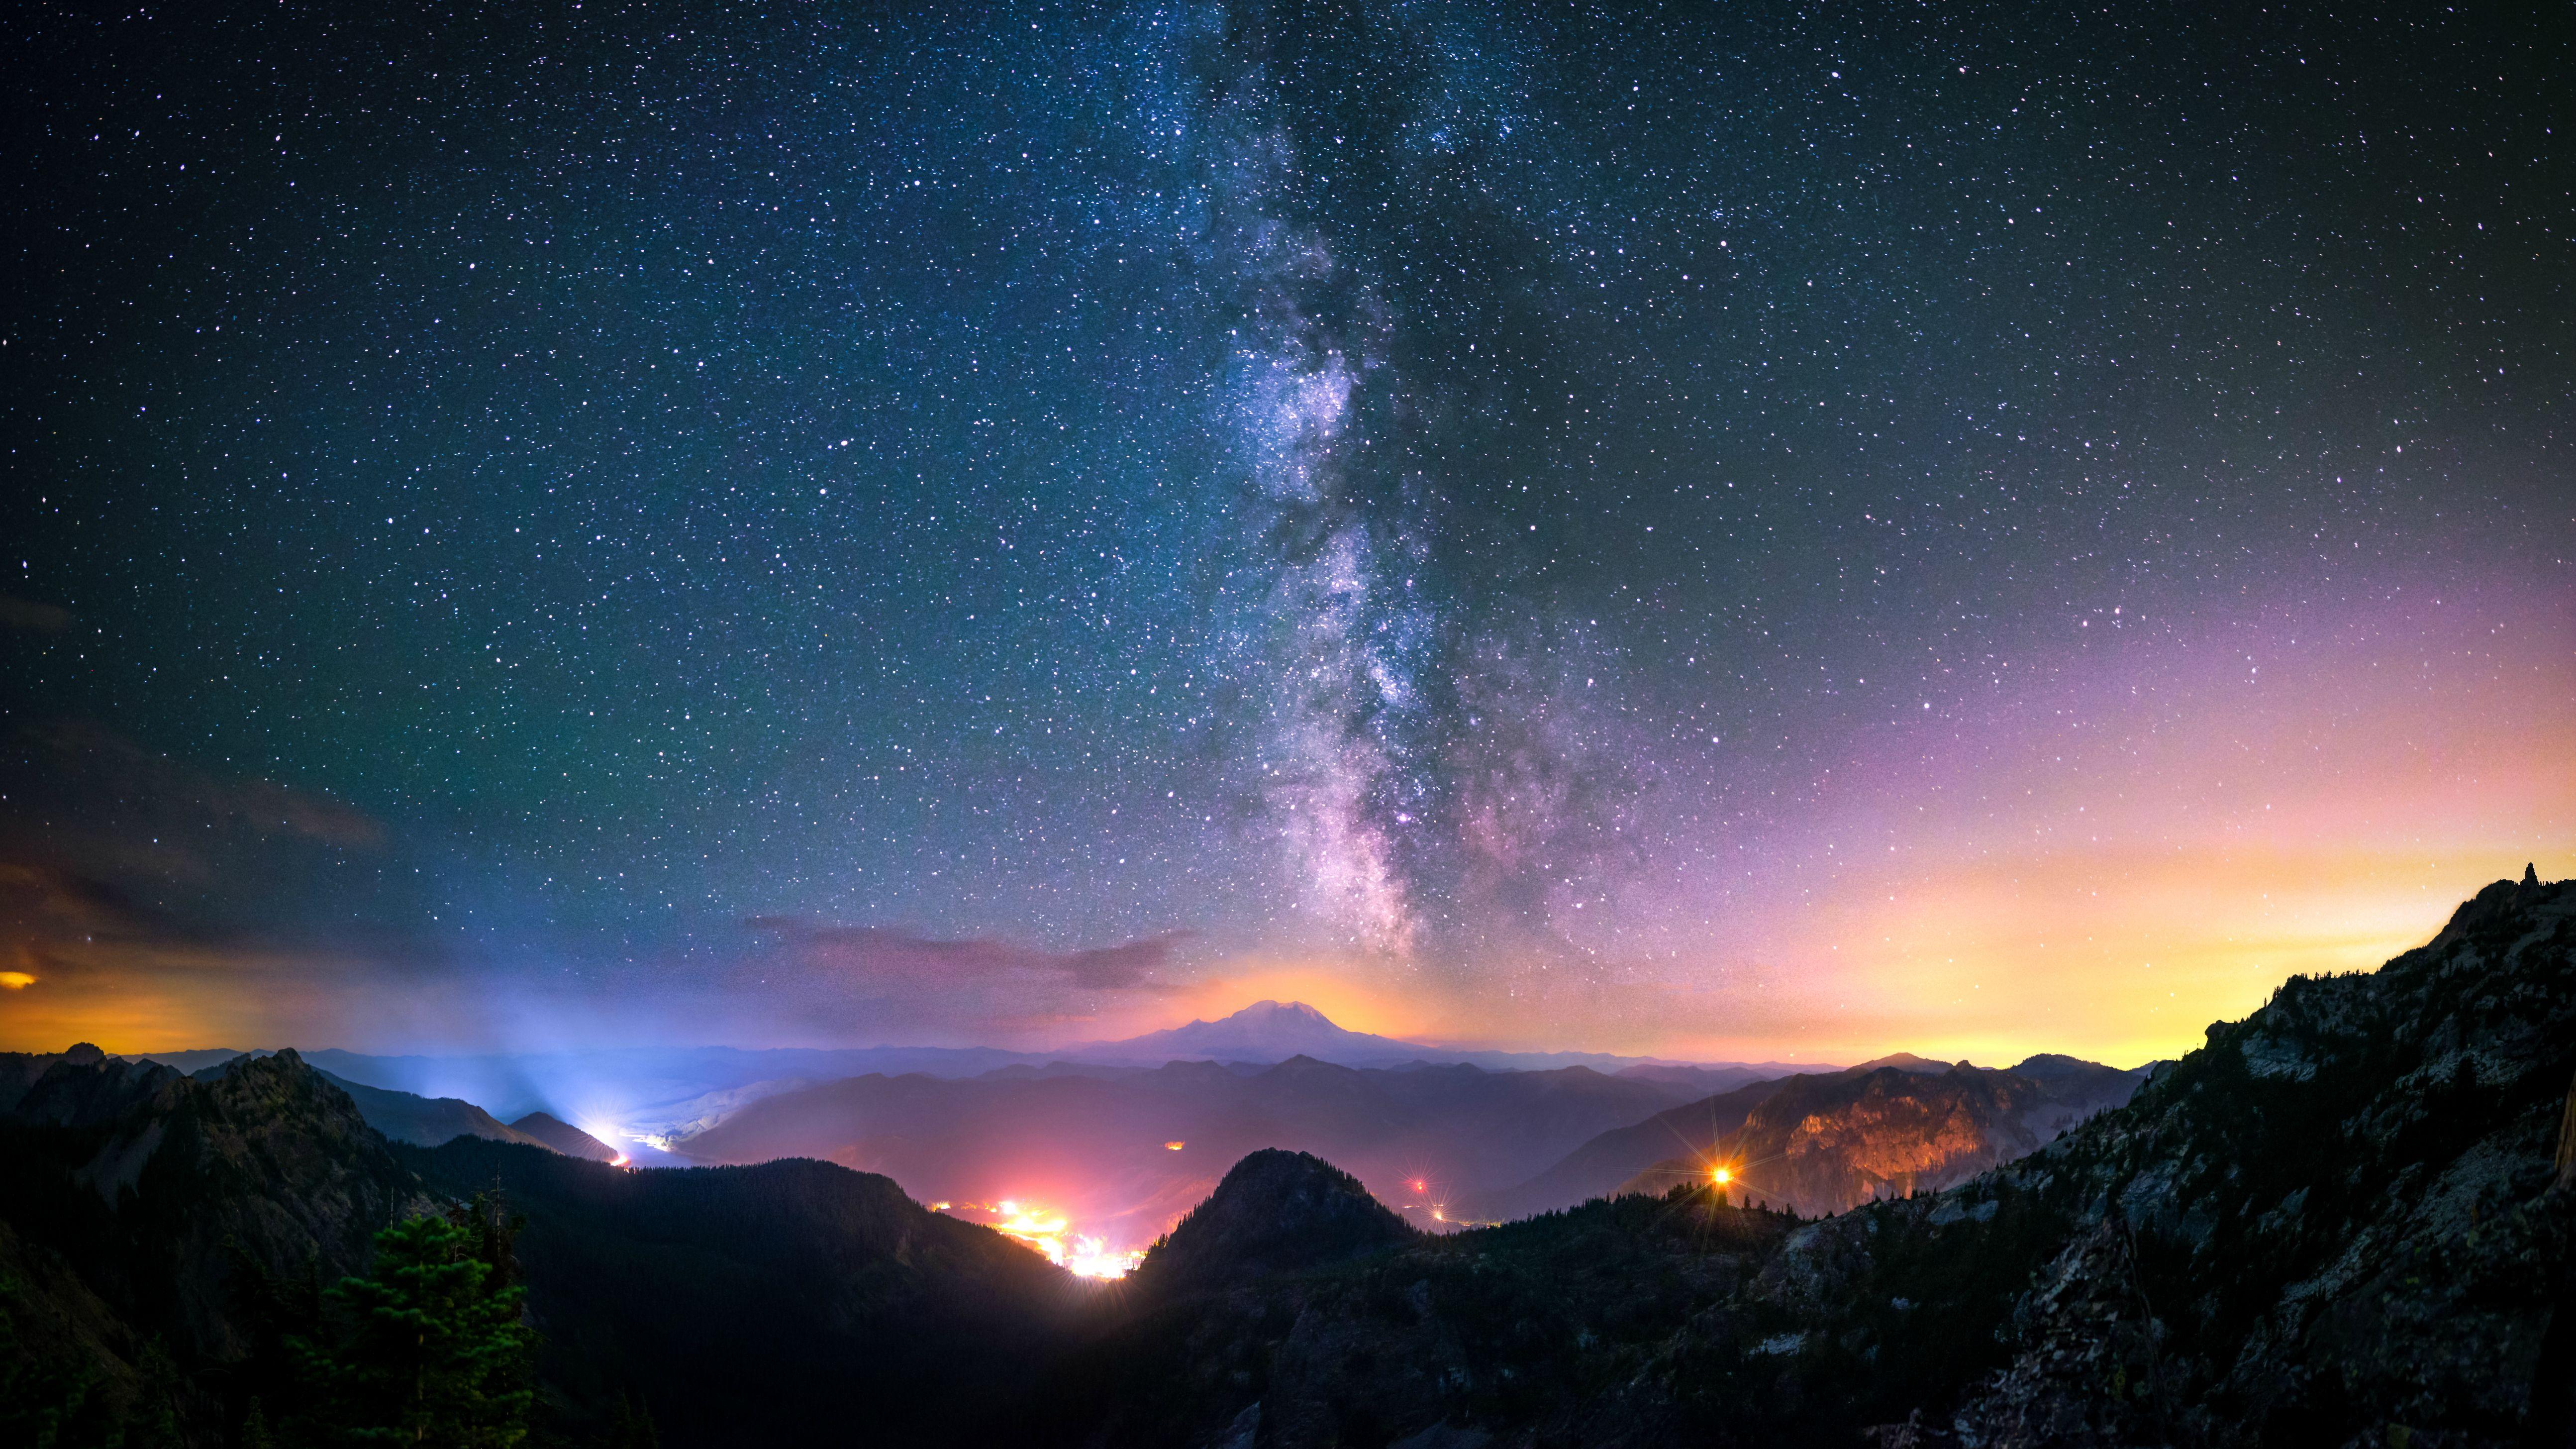 Milky Way 5k Retina Ultra Hd Wallpaper Background Image